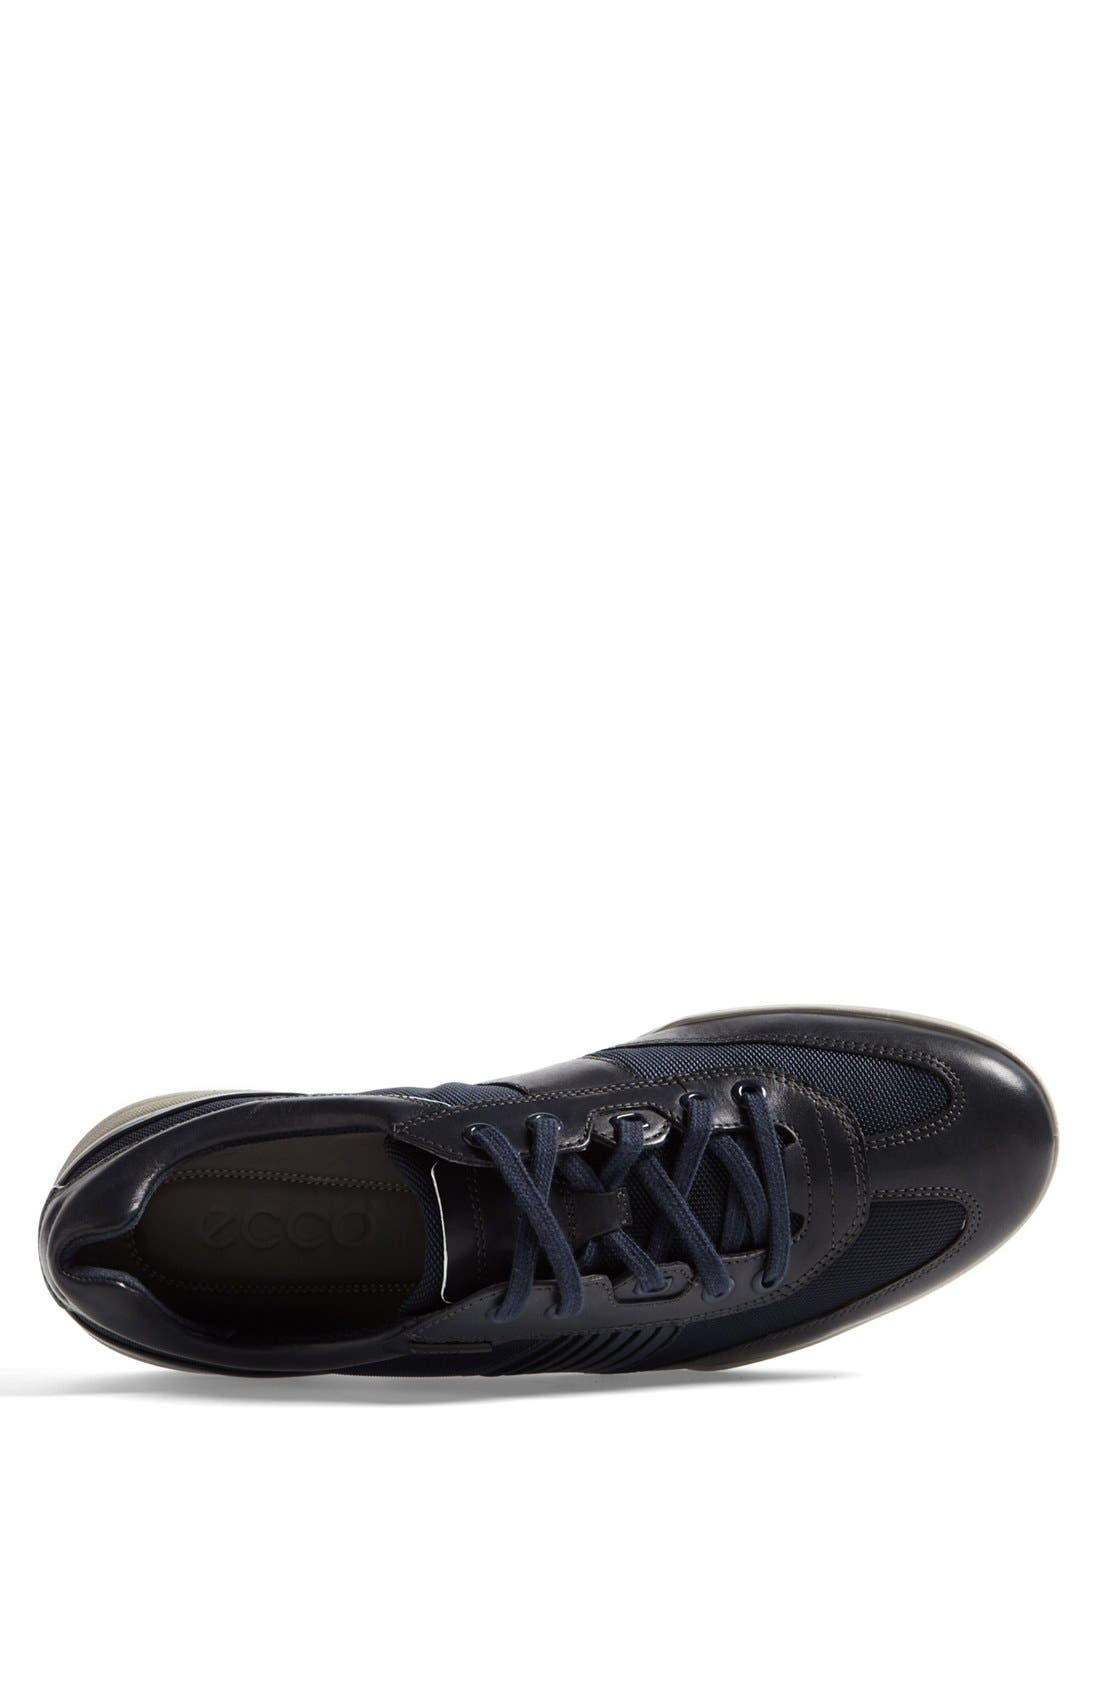 Alternate Image 3  - ECCO 'Enrico' Sneaker